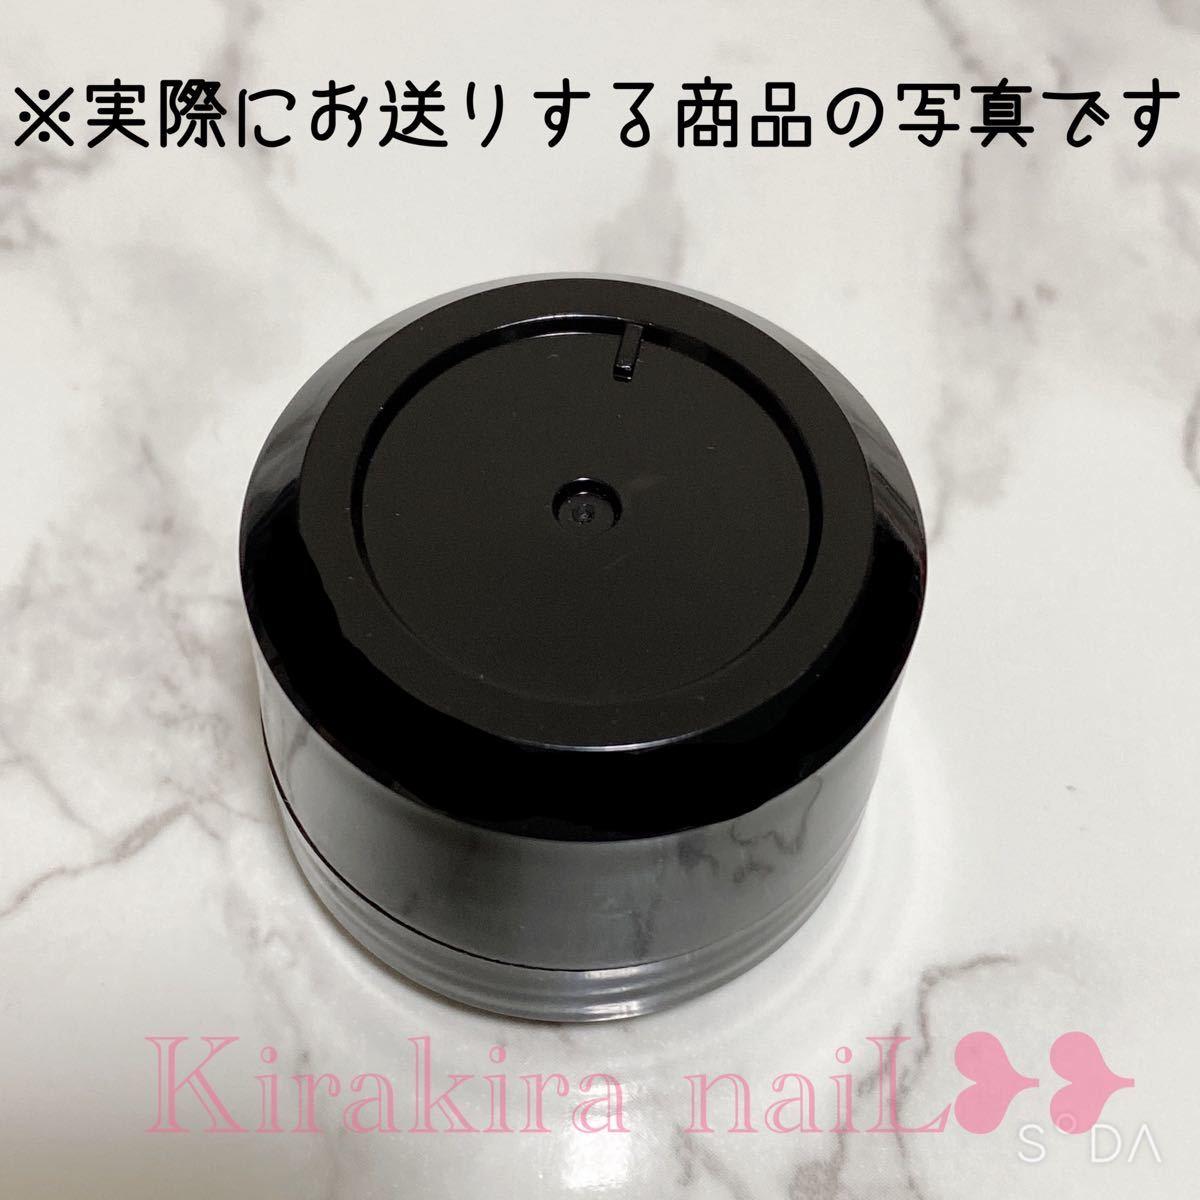 New★全12種☆Venalisa☆グリッタージェル☆カラーラメジェル P53